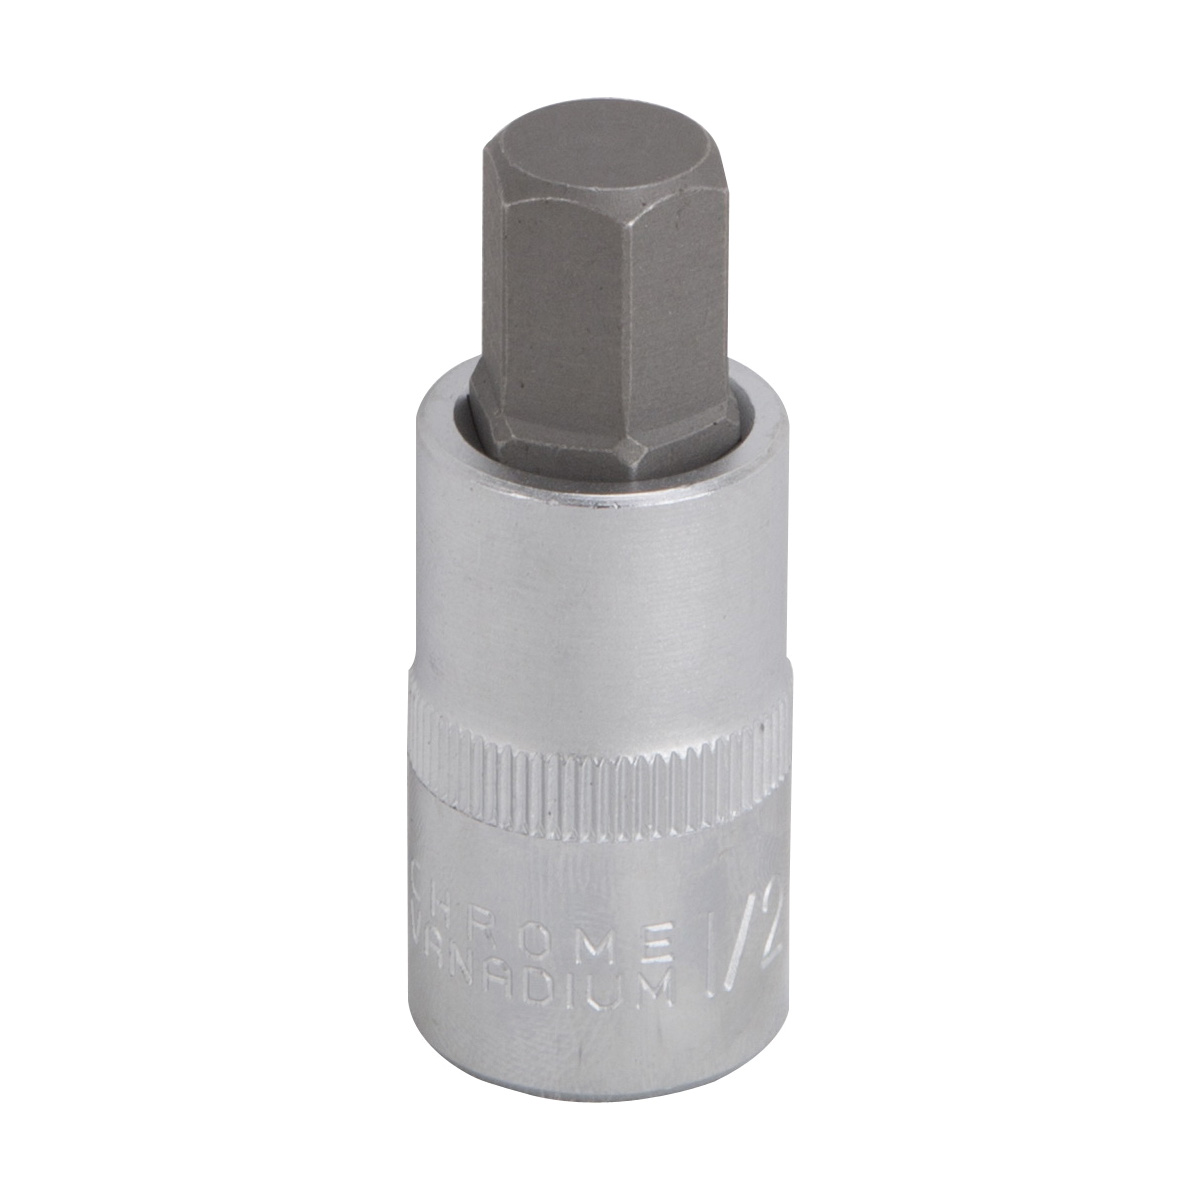 Picture of Vulcan 3506012113 Hex Bit Socket, 1/2 in Tip, 1/2 in Drive, Chrome Vanadium